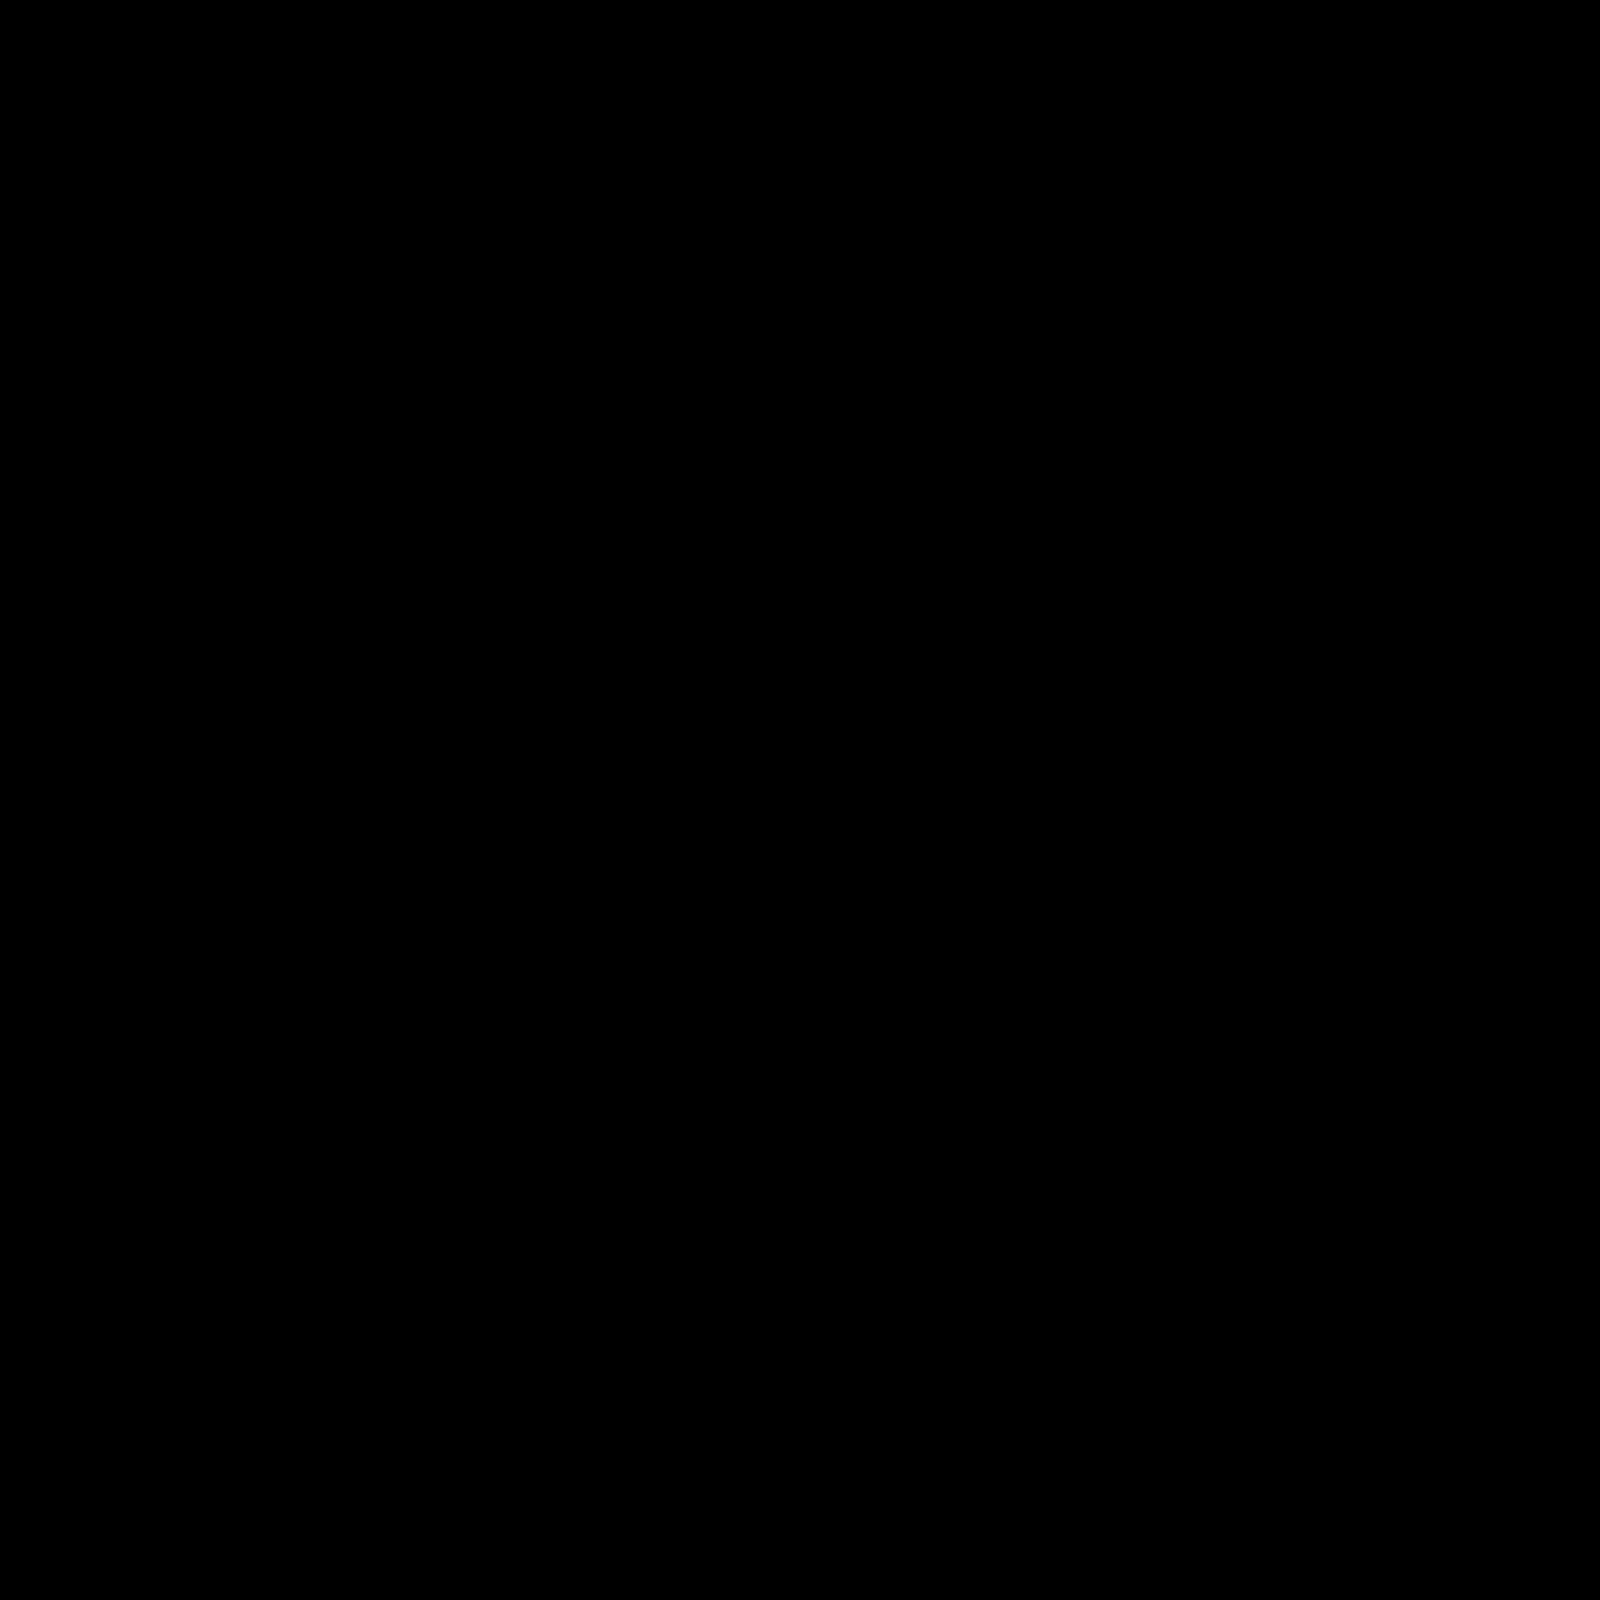 Paw PNG HD-PlusPNG.com-1600 - Paw PNG HD